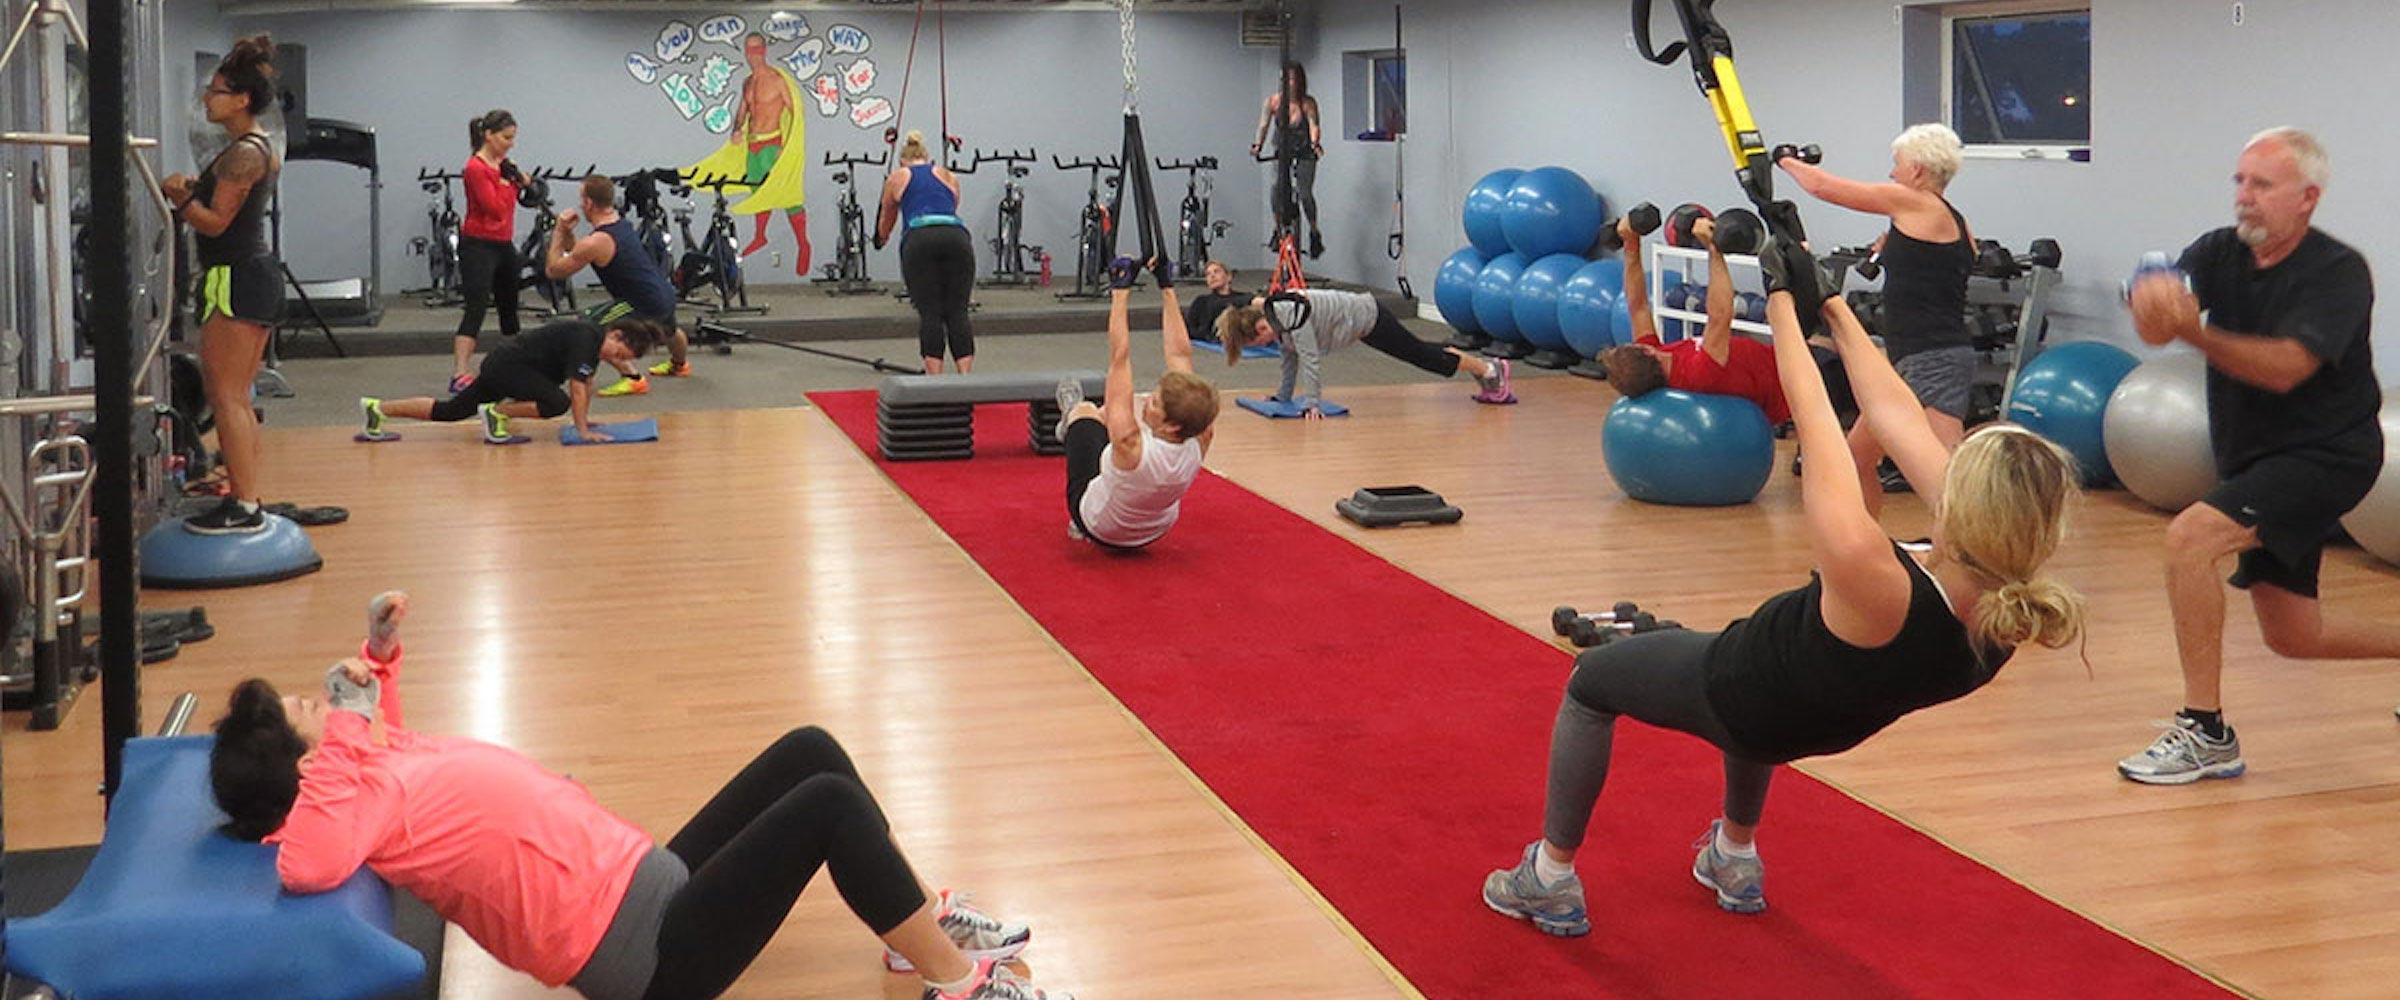 Fitness & Massage at Elite Training Facility